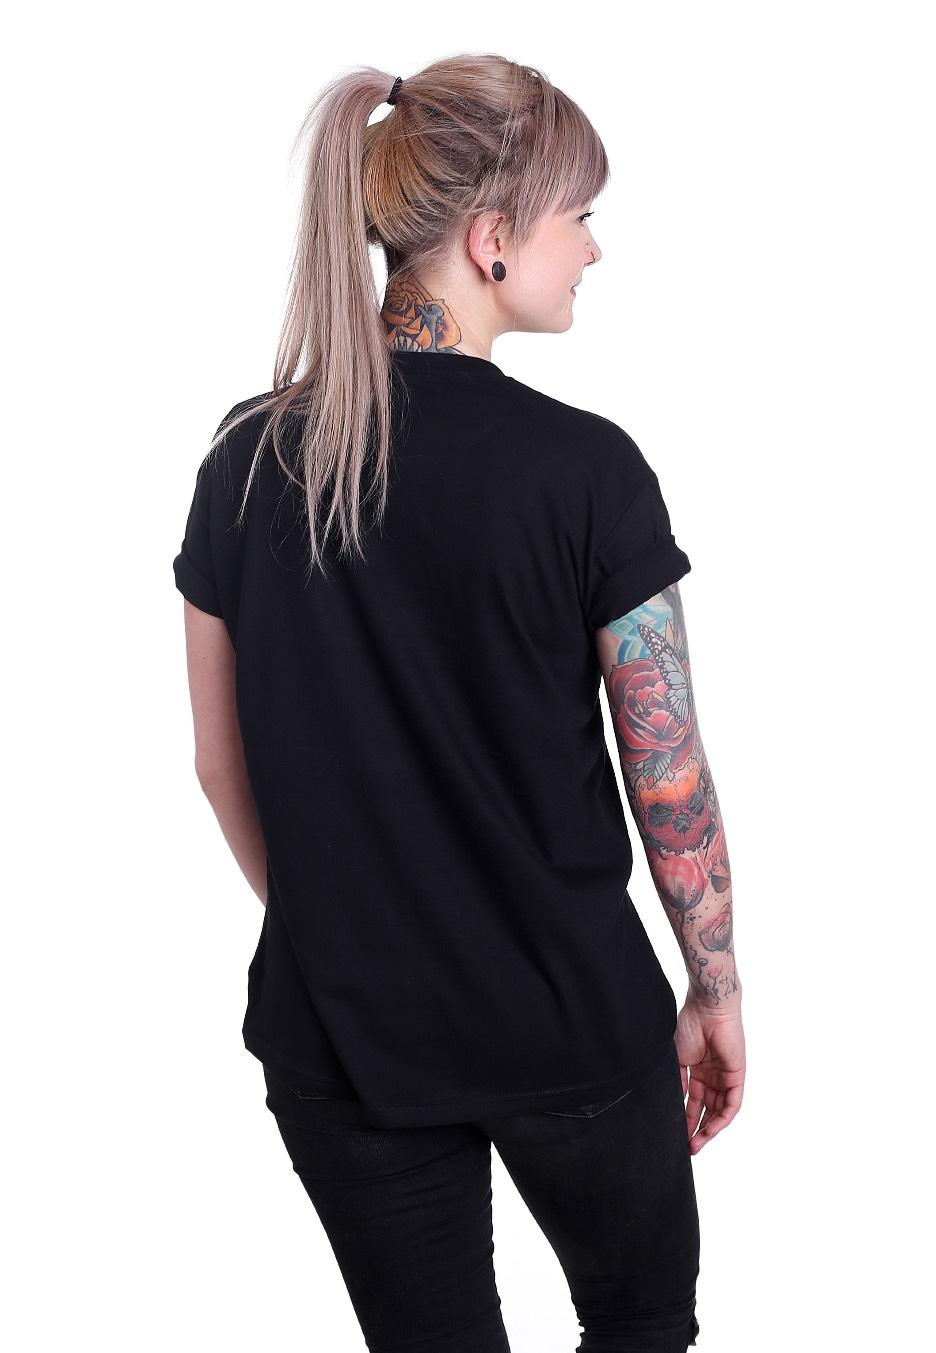 chelsea grin hand with knife t shirt official deathcore merchandise shop uk. Black Bedroom Furniture Sets. Home Design Ideas